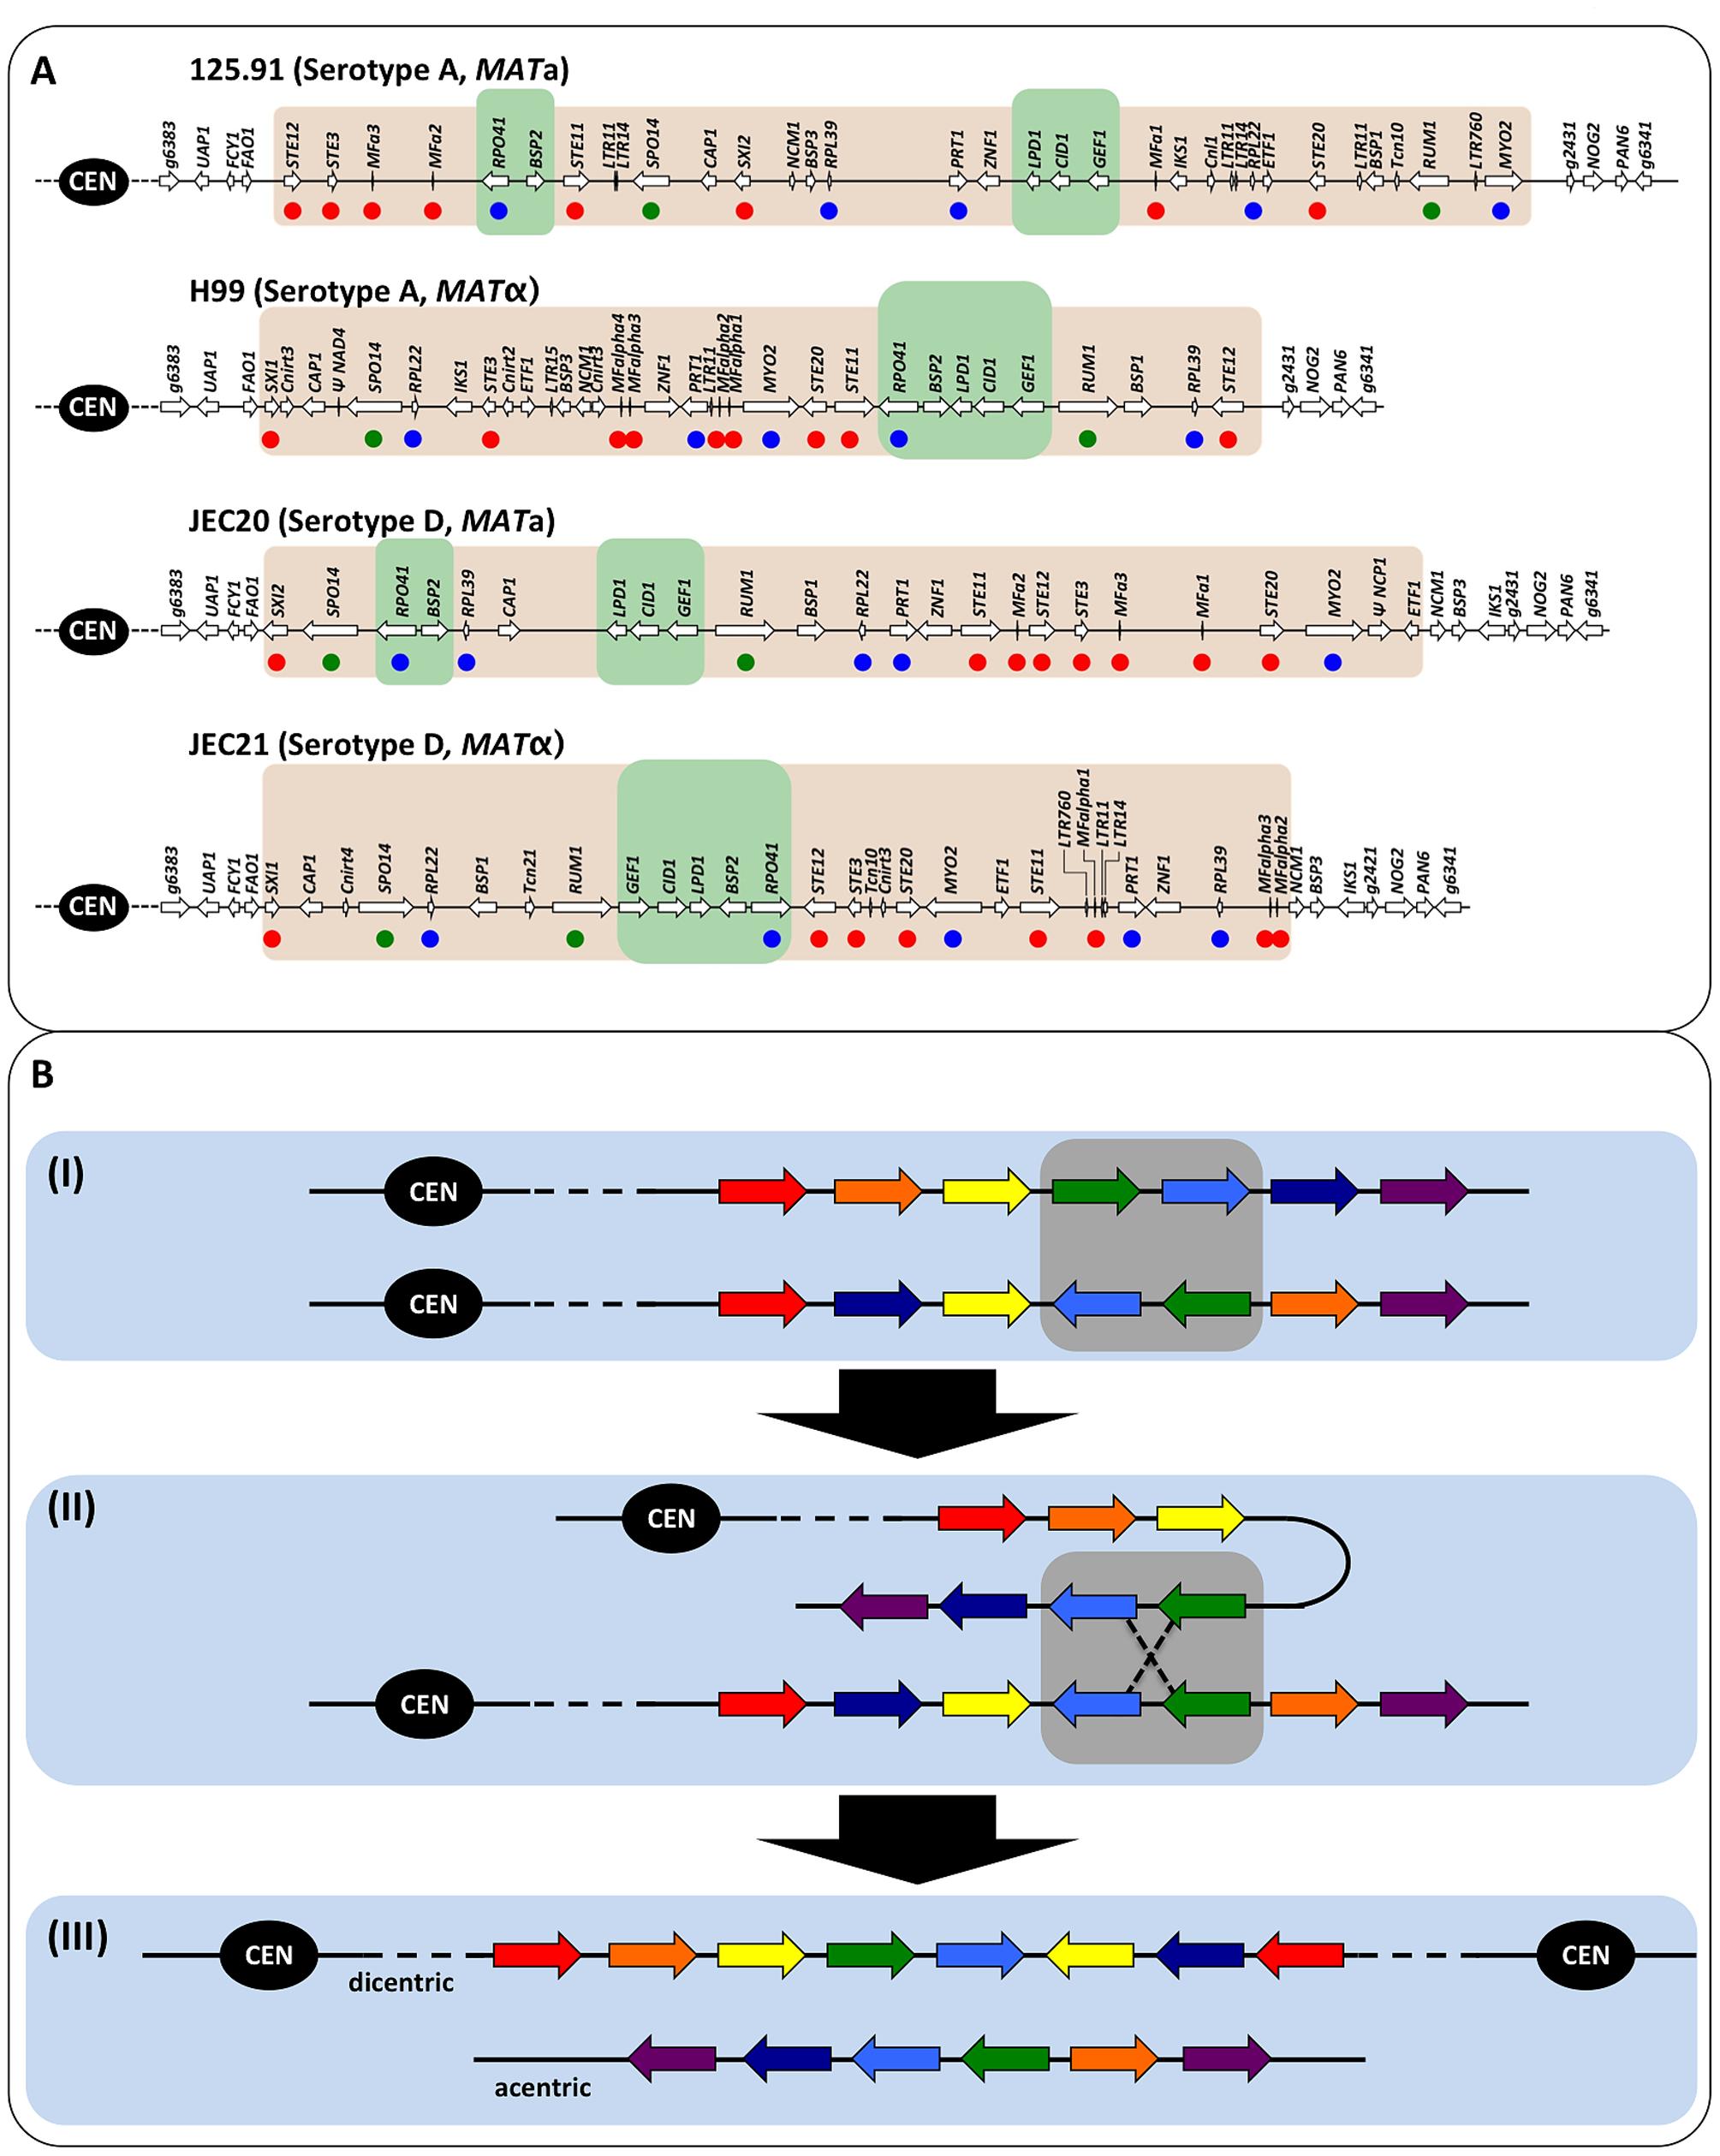 Diagrams of the <i>MAT</i> loci of <i>C. neoformans</i> var. <i>grubii</i> and var. <i>neoformans</i> and illustration of meiotic recombination within inverted chromosomal region.